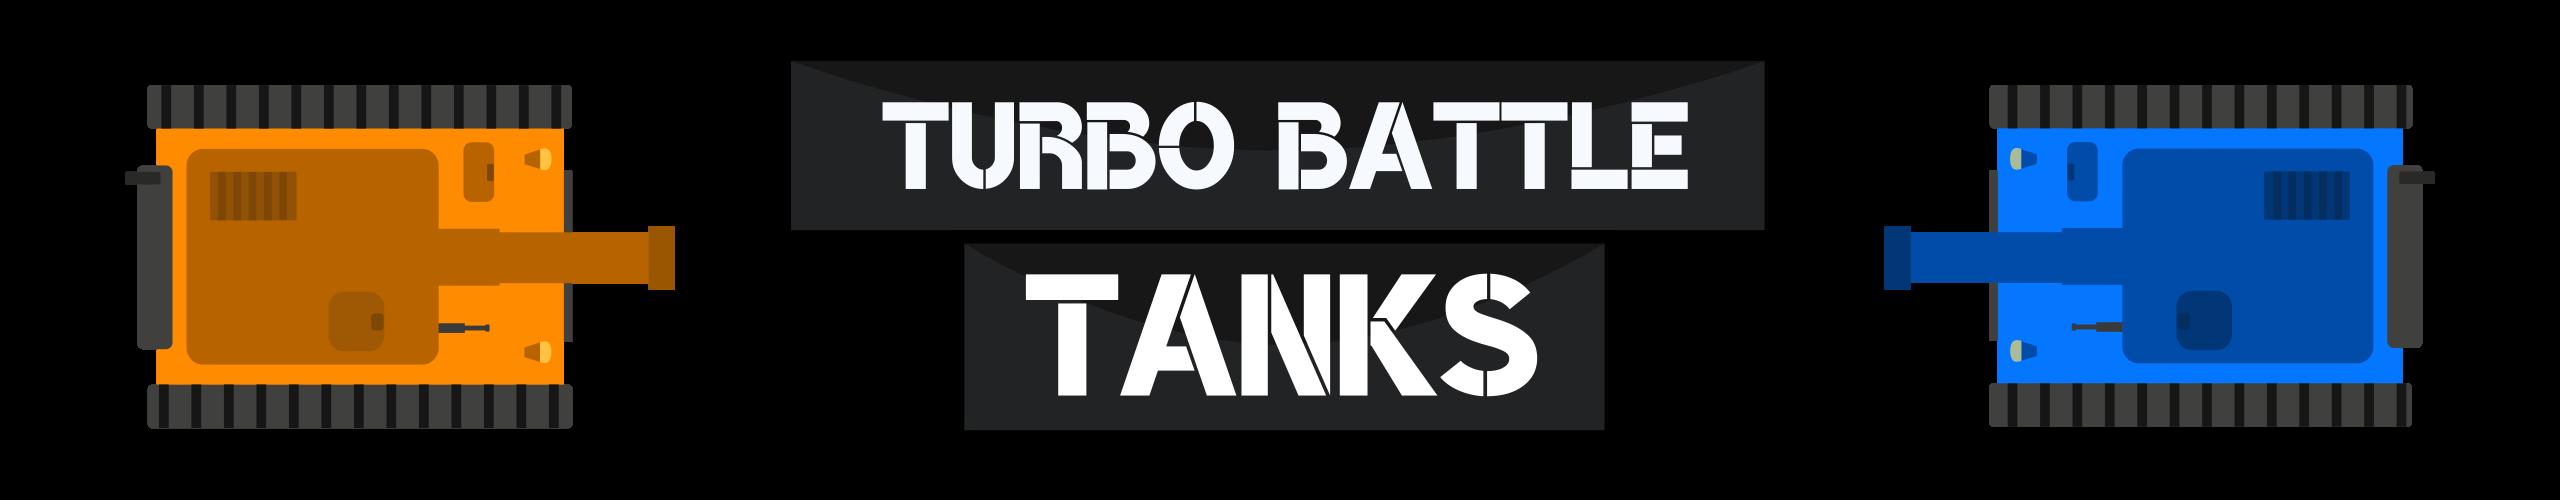 TBT banner